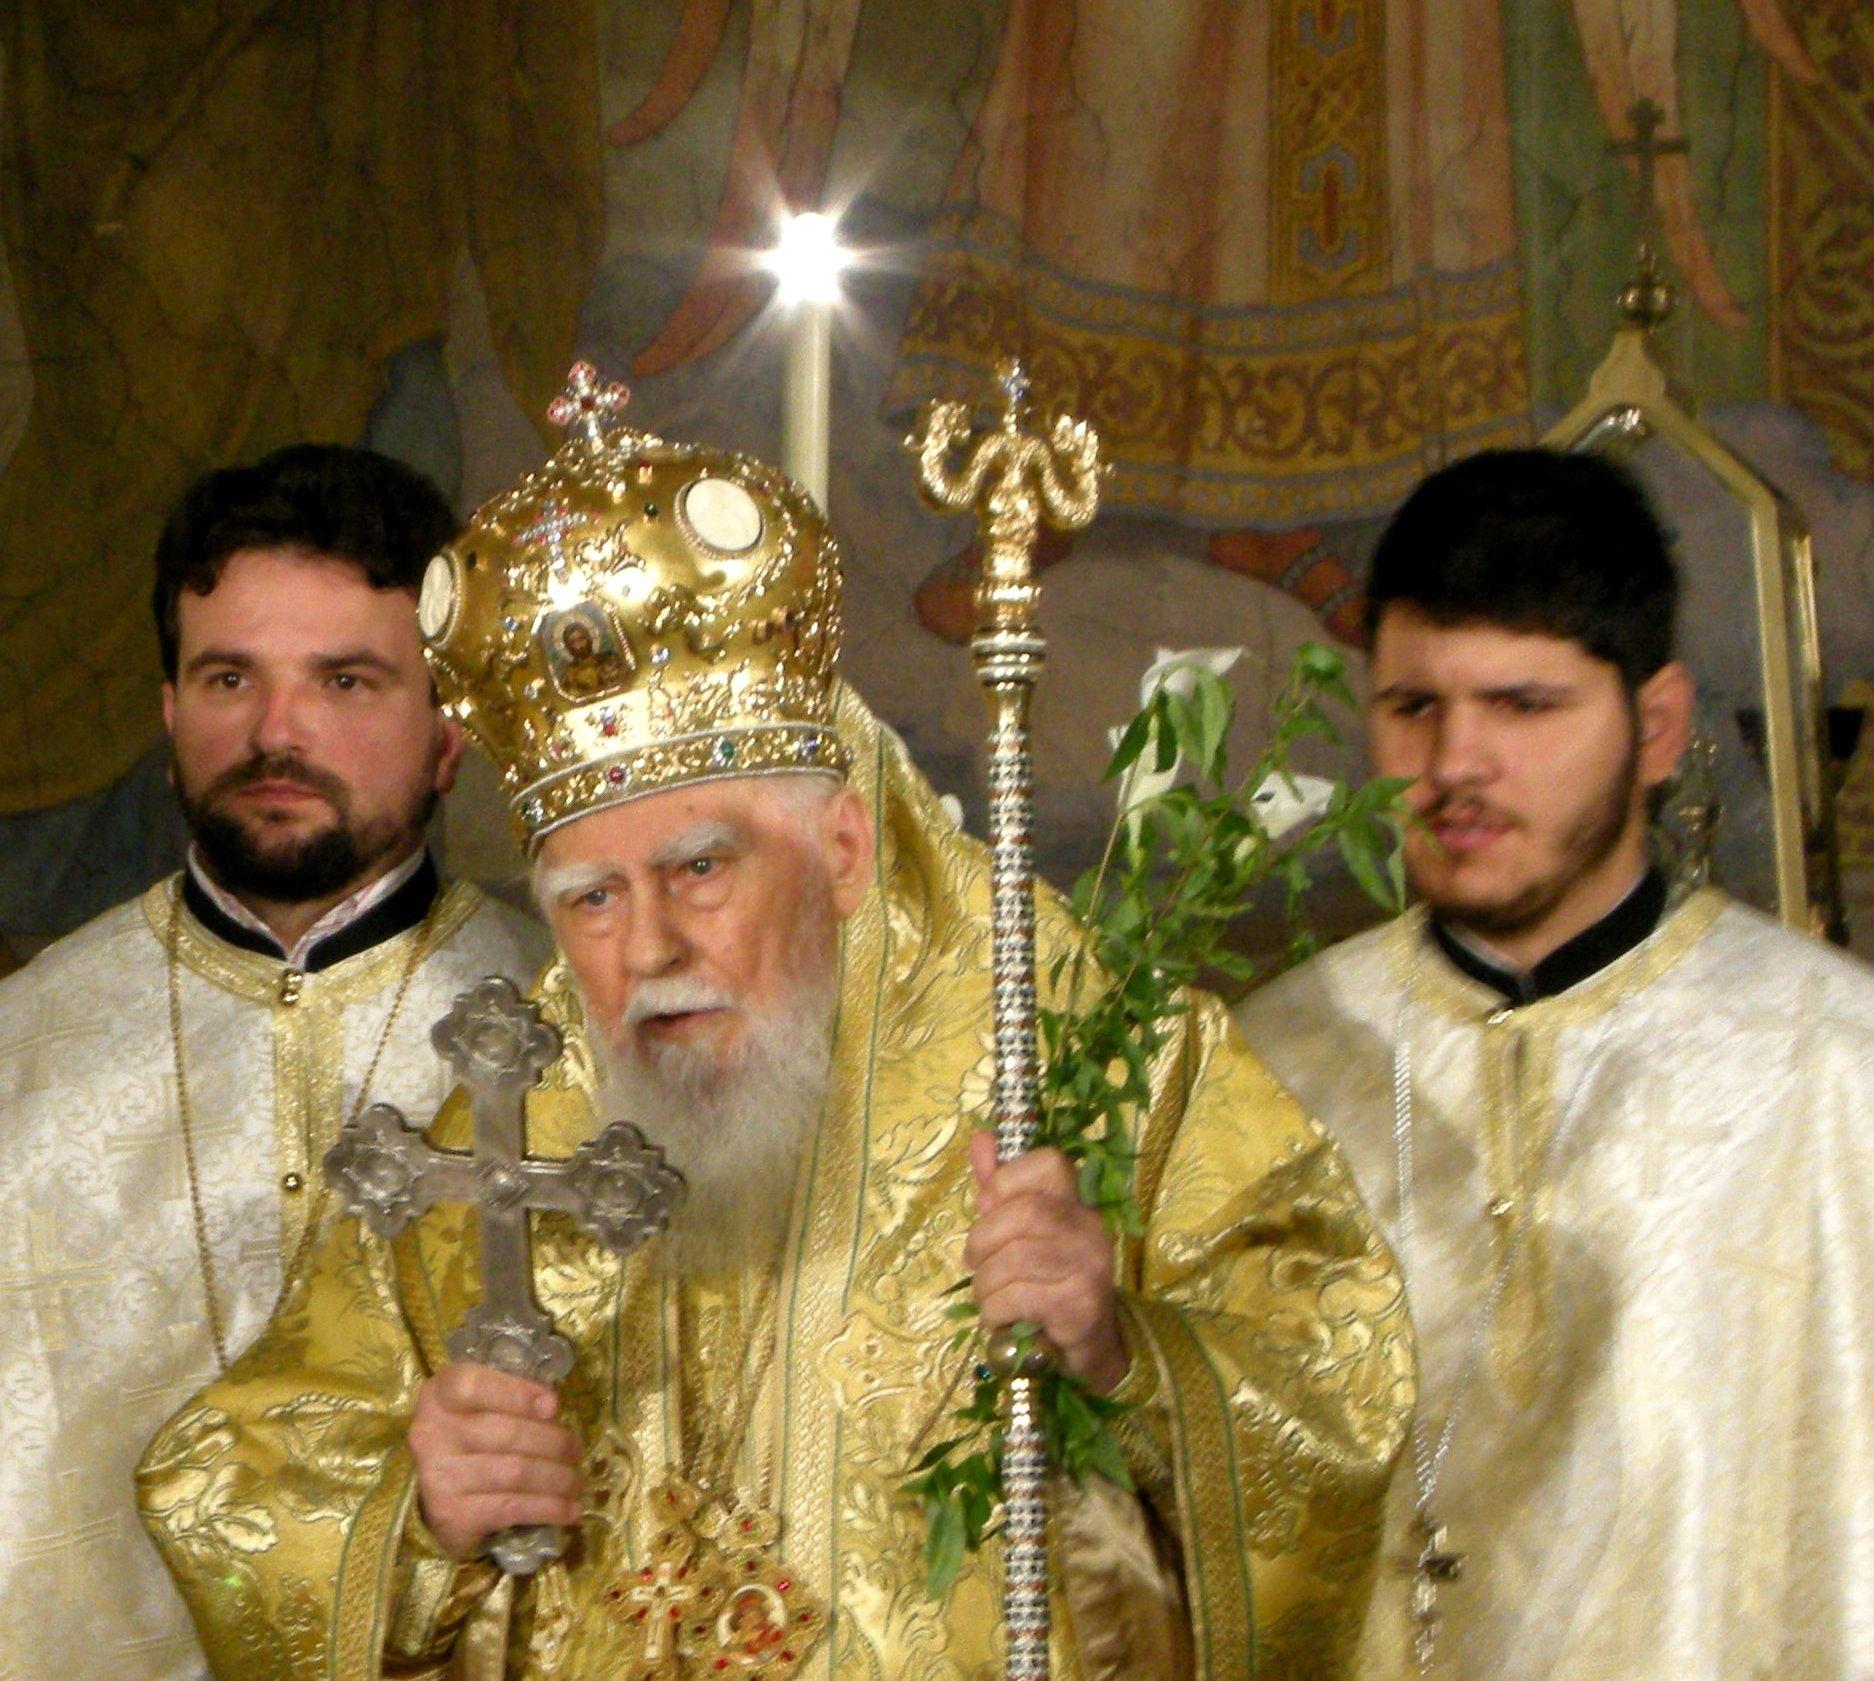 Patriarch Maxim of Bulgaria Orthodox Church